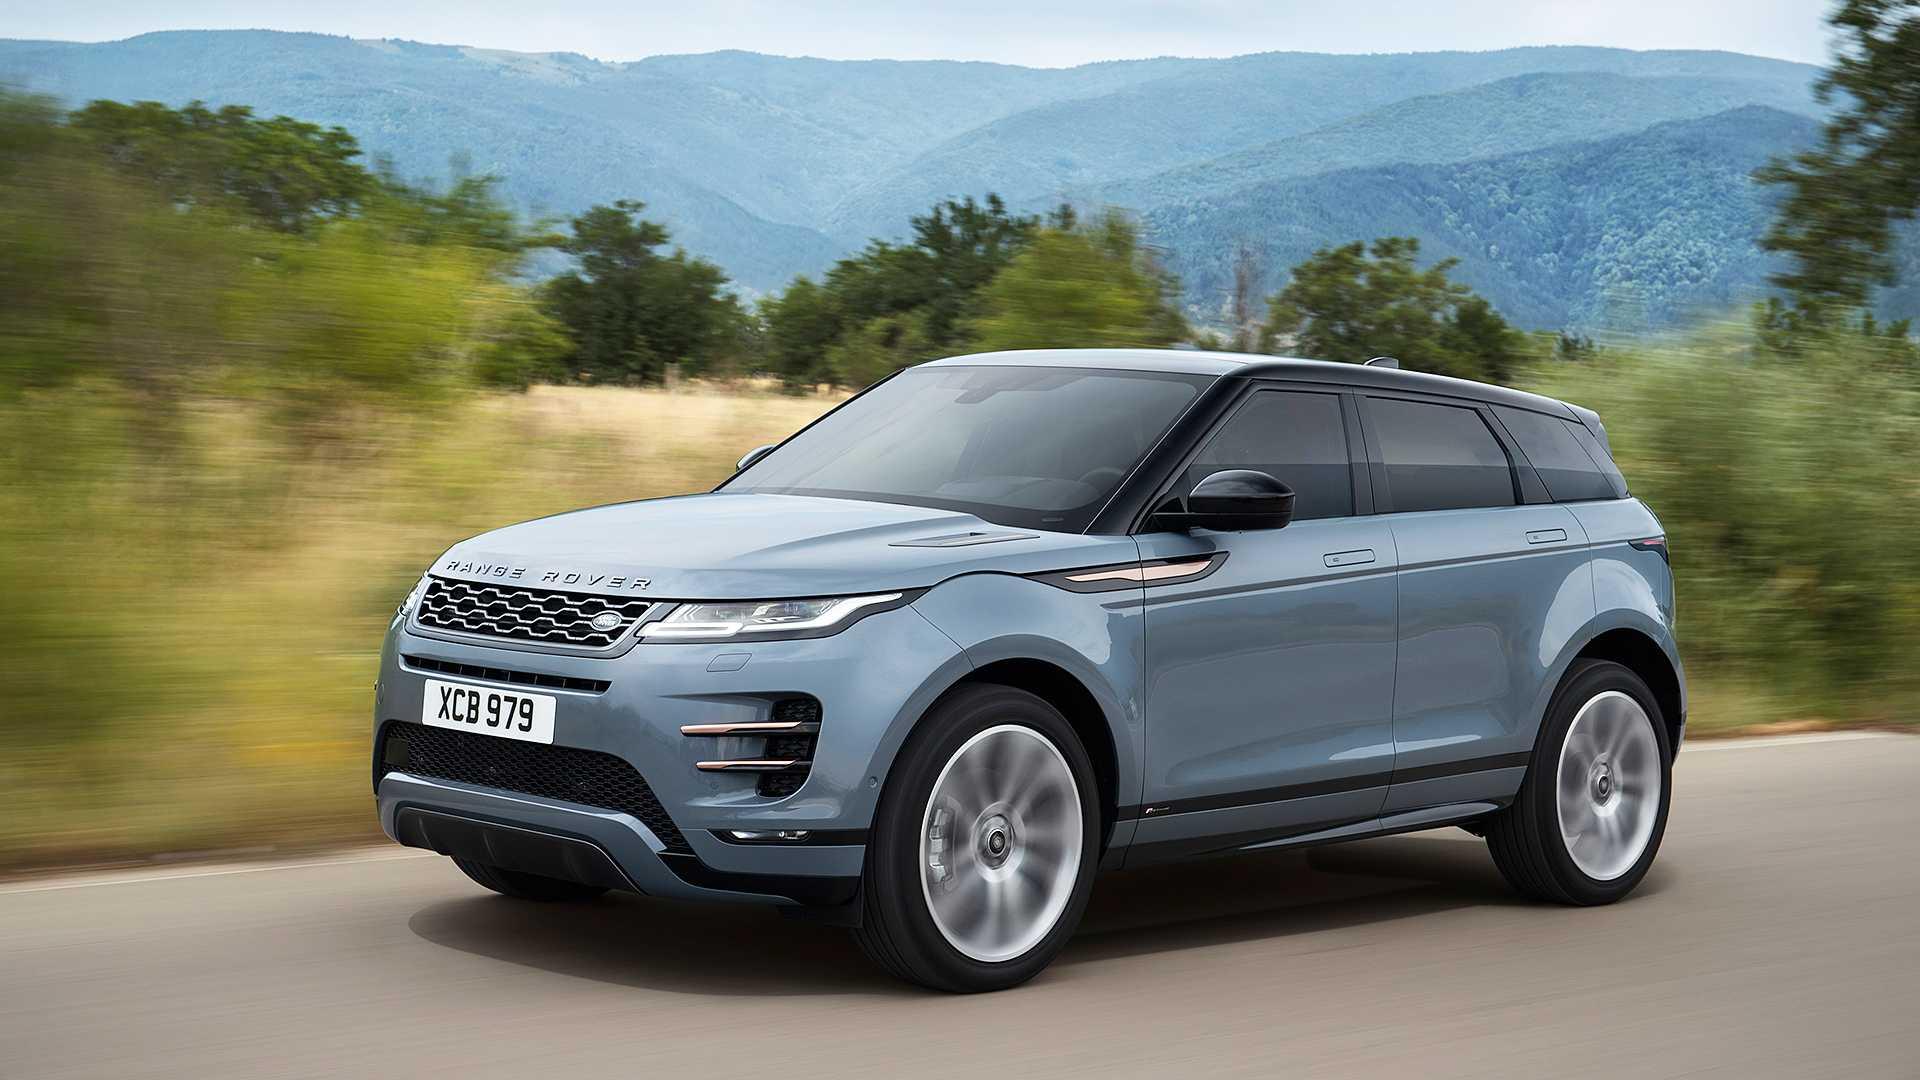 2020-range-rover-evoque (20)